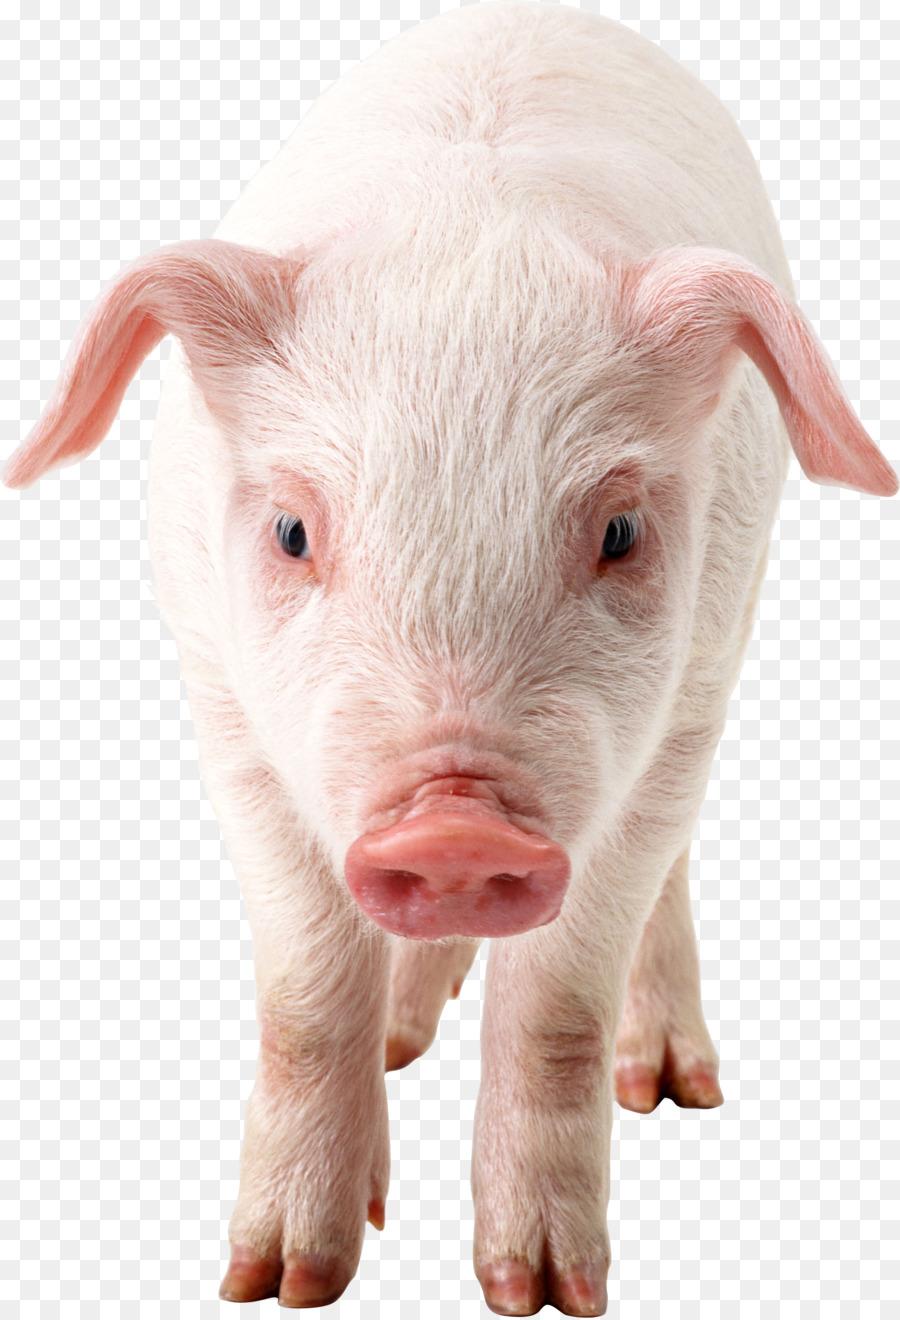 pigs transparent background clipart Domestic pig